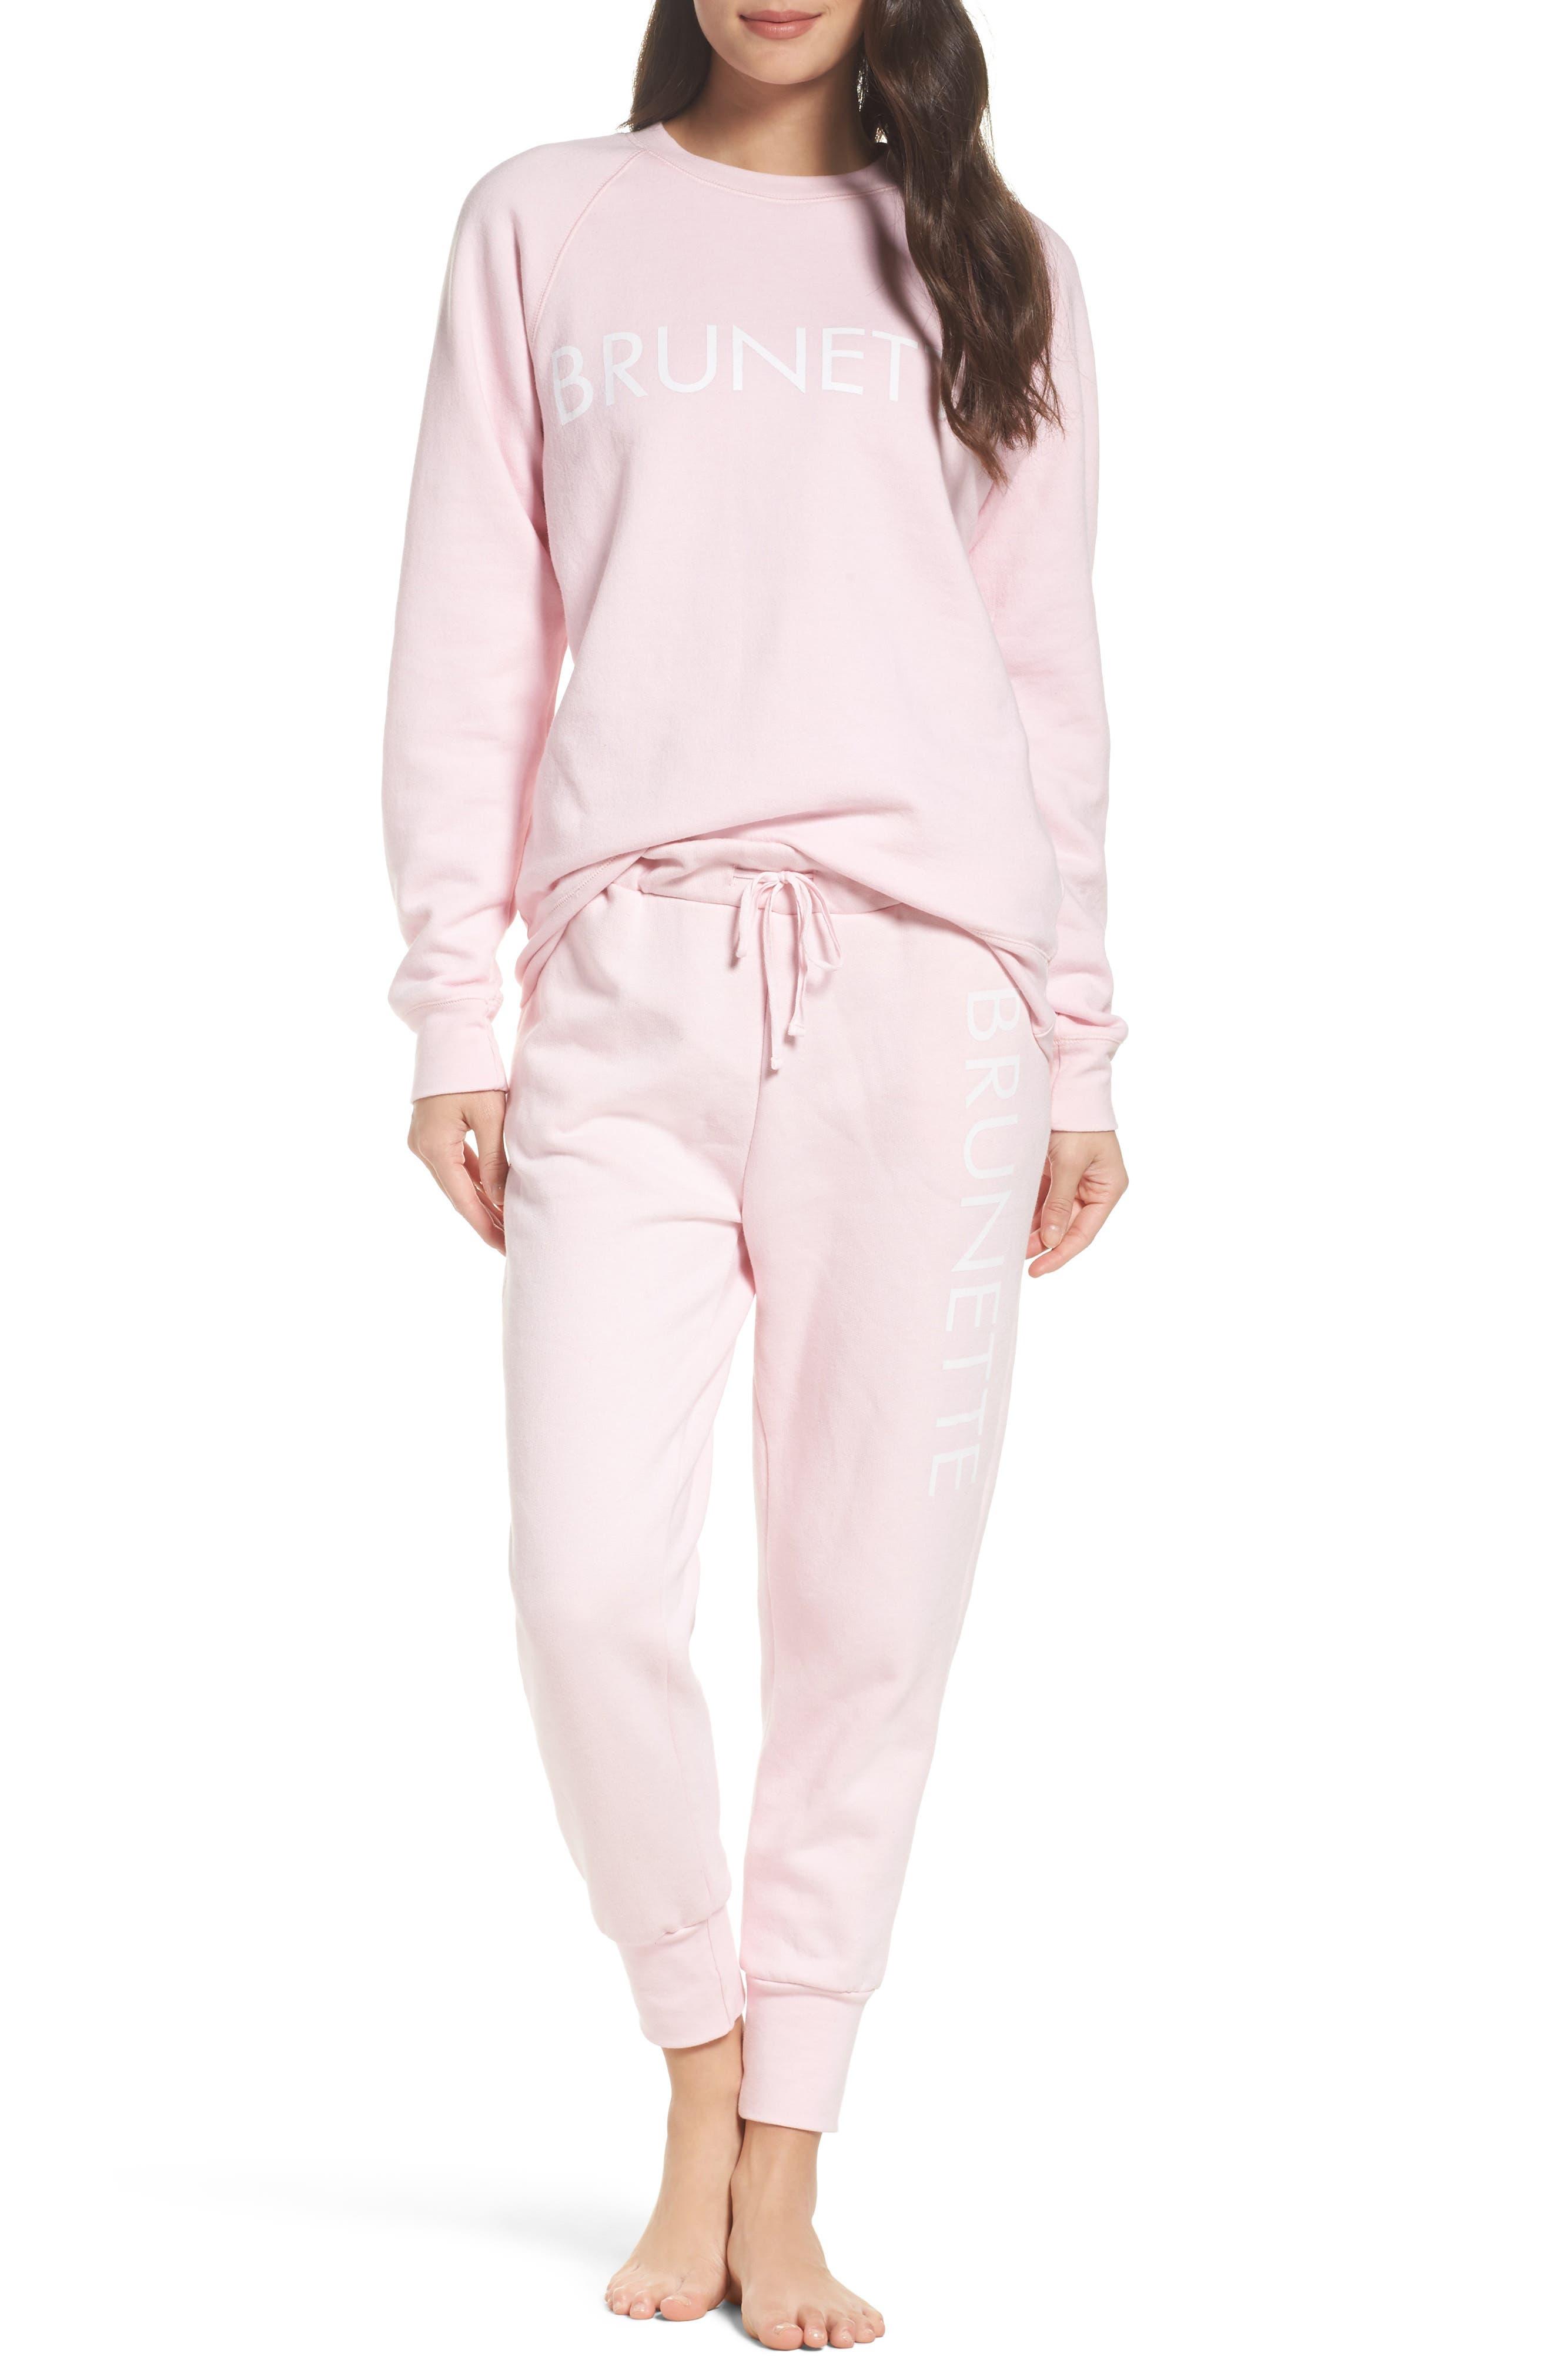 Brunette Jogger Pants,                             Alternate thumbnail 5, color,                             Pink